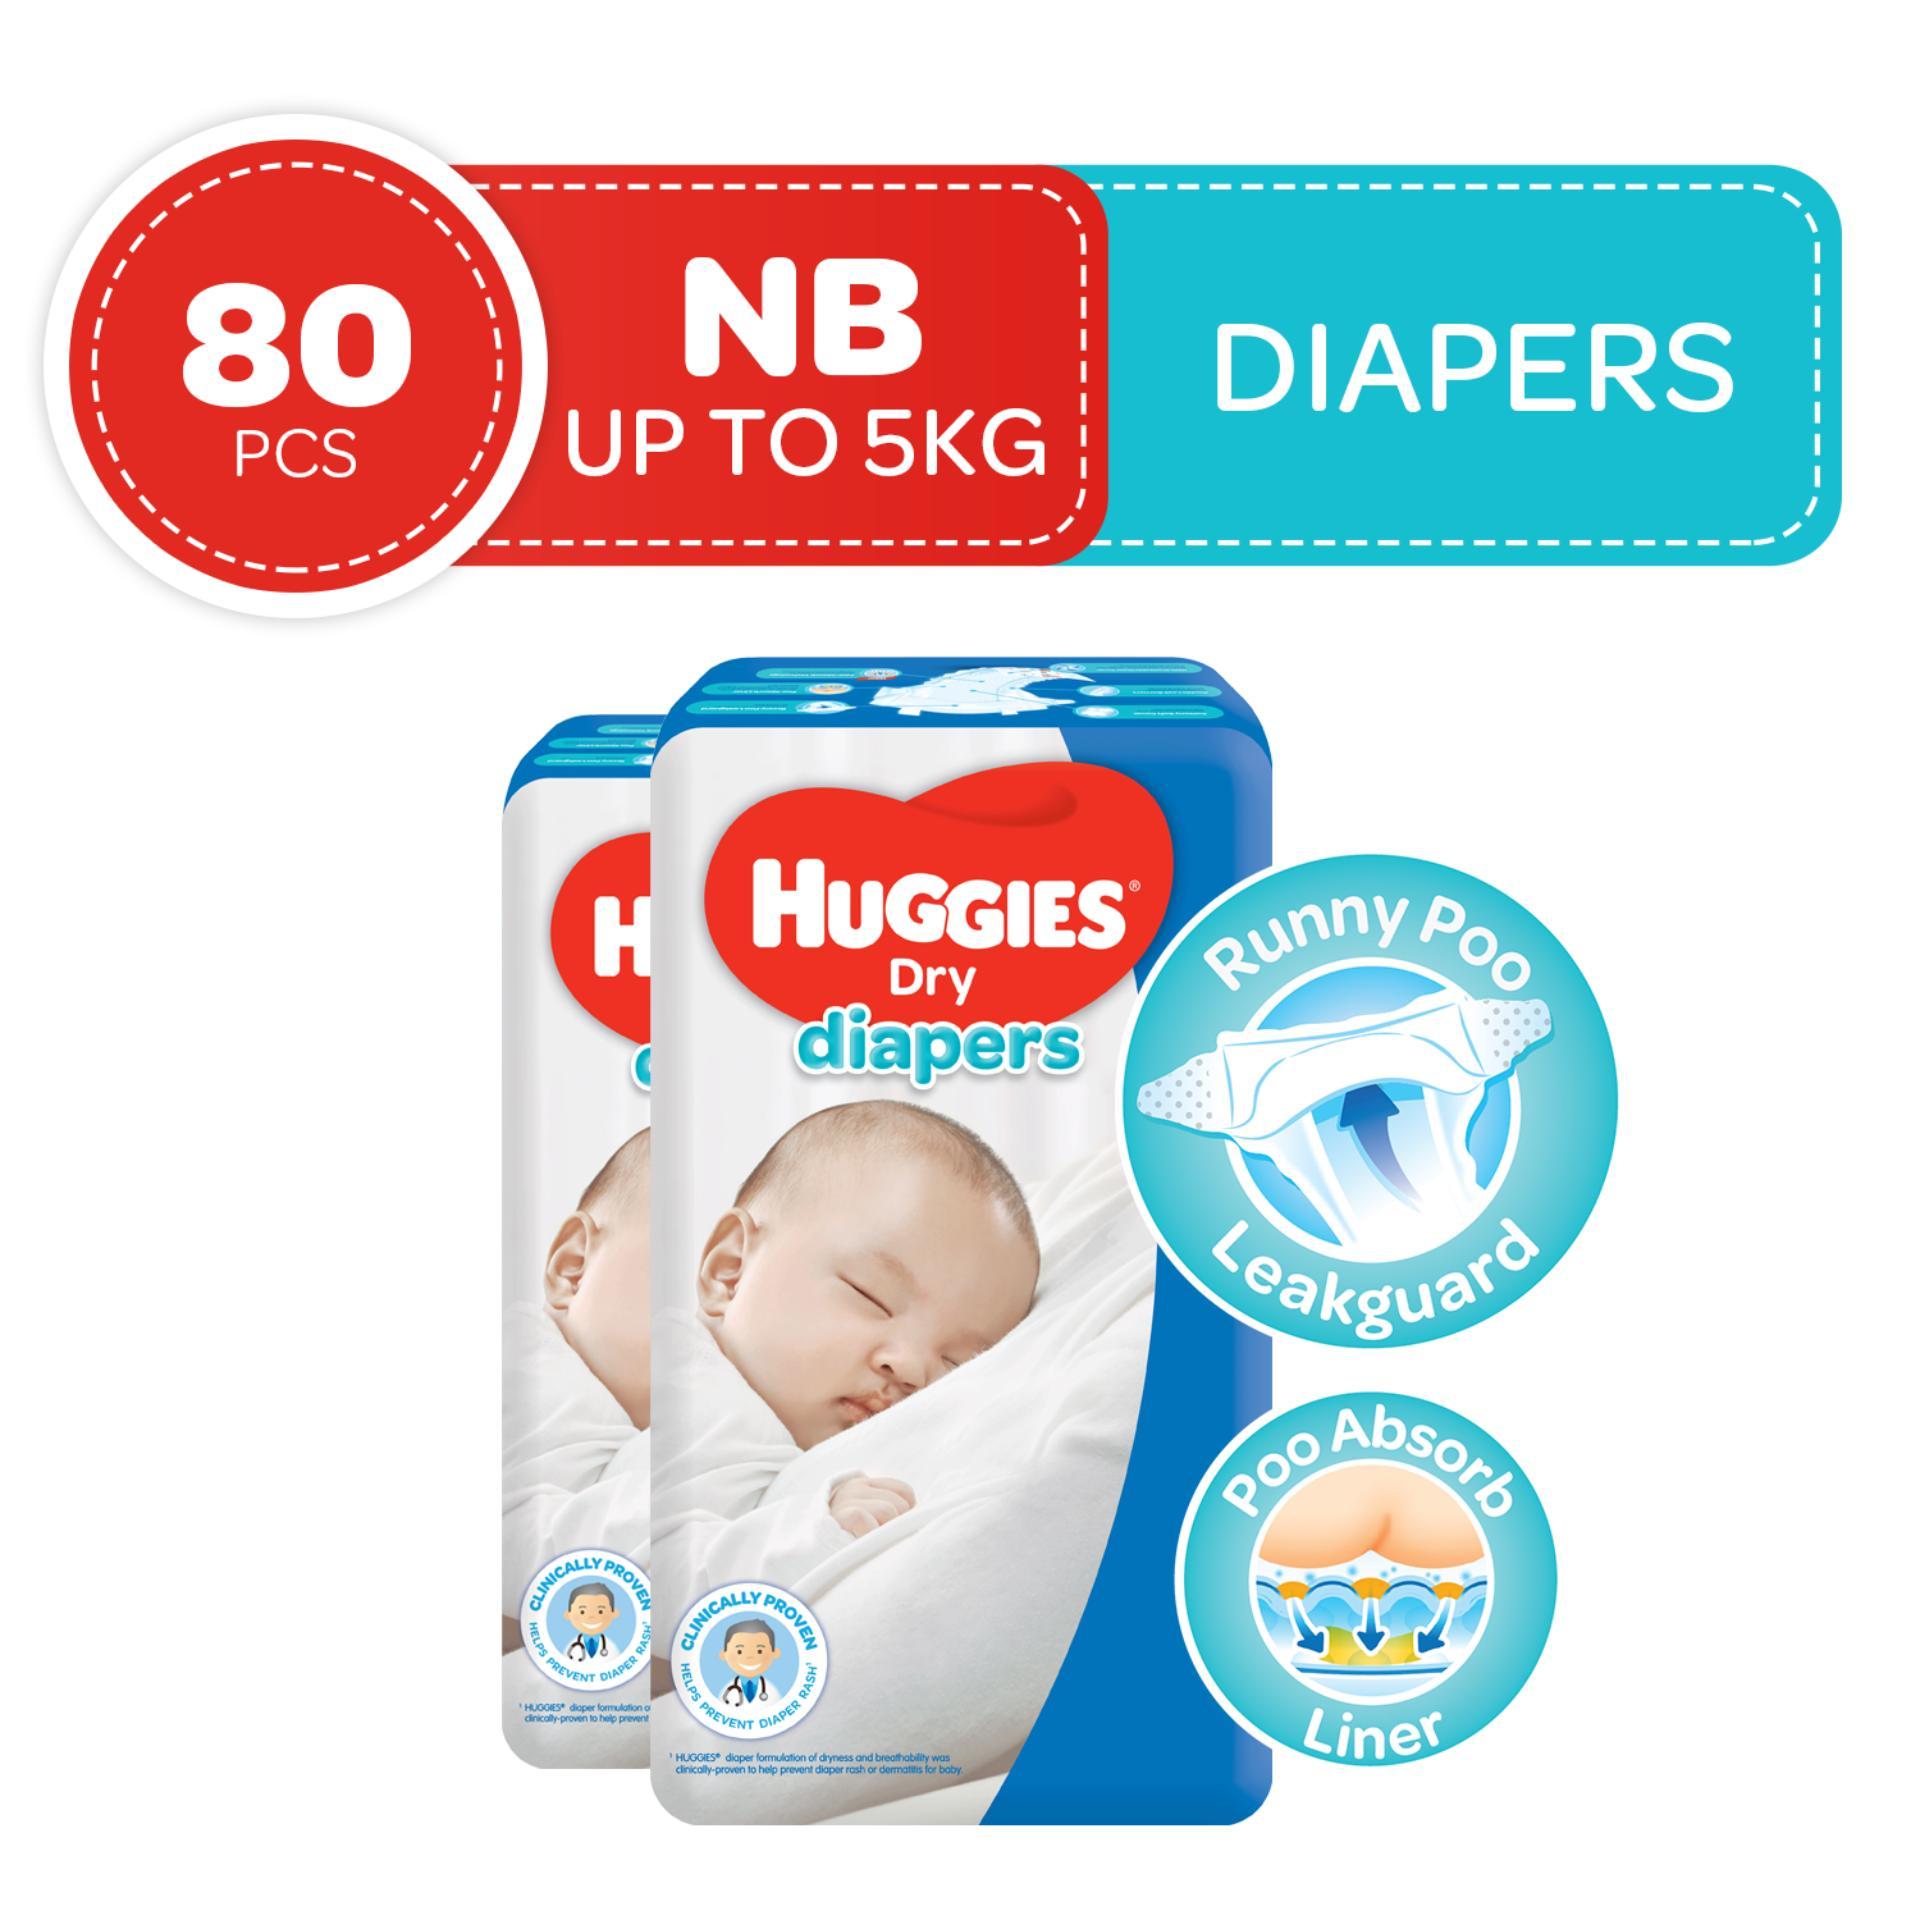 Huggies Dry Newborn - 40 pcs x 2 packs (80 pcs) - Tape Diapers